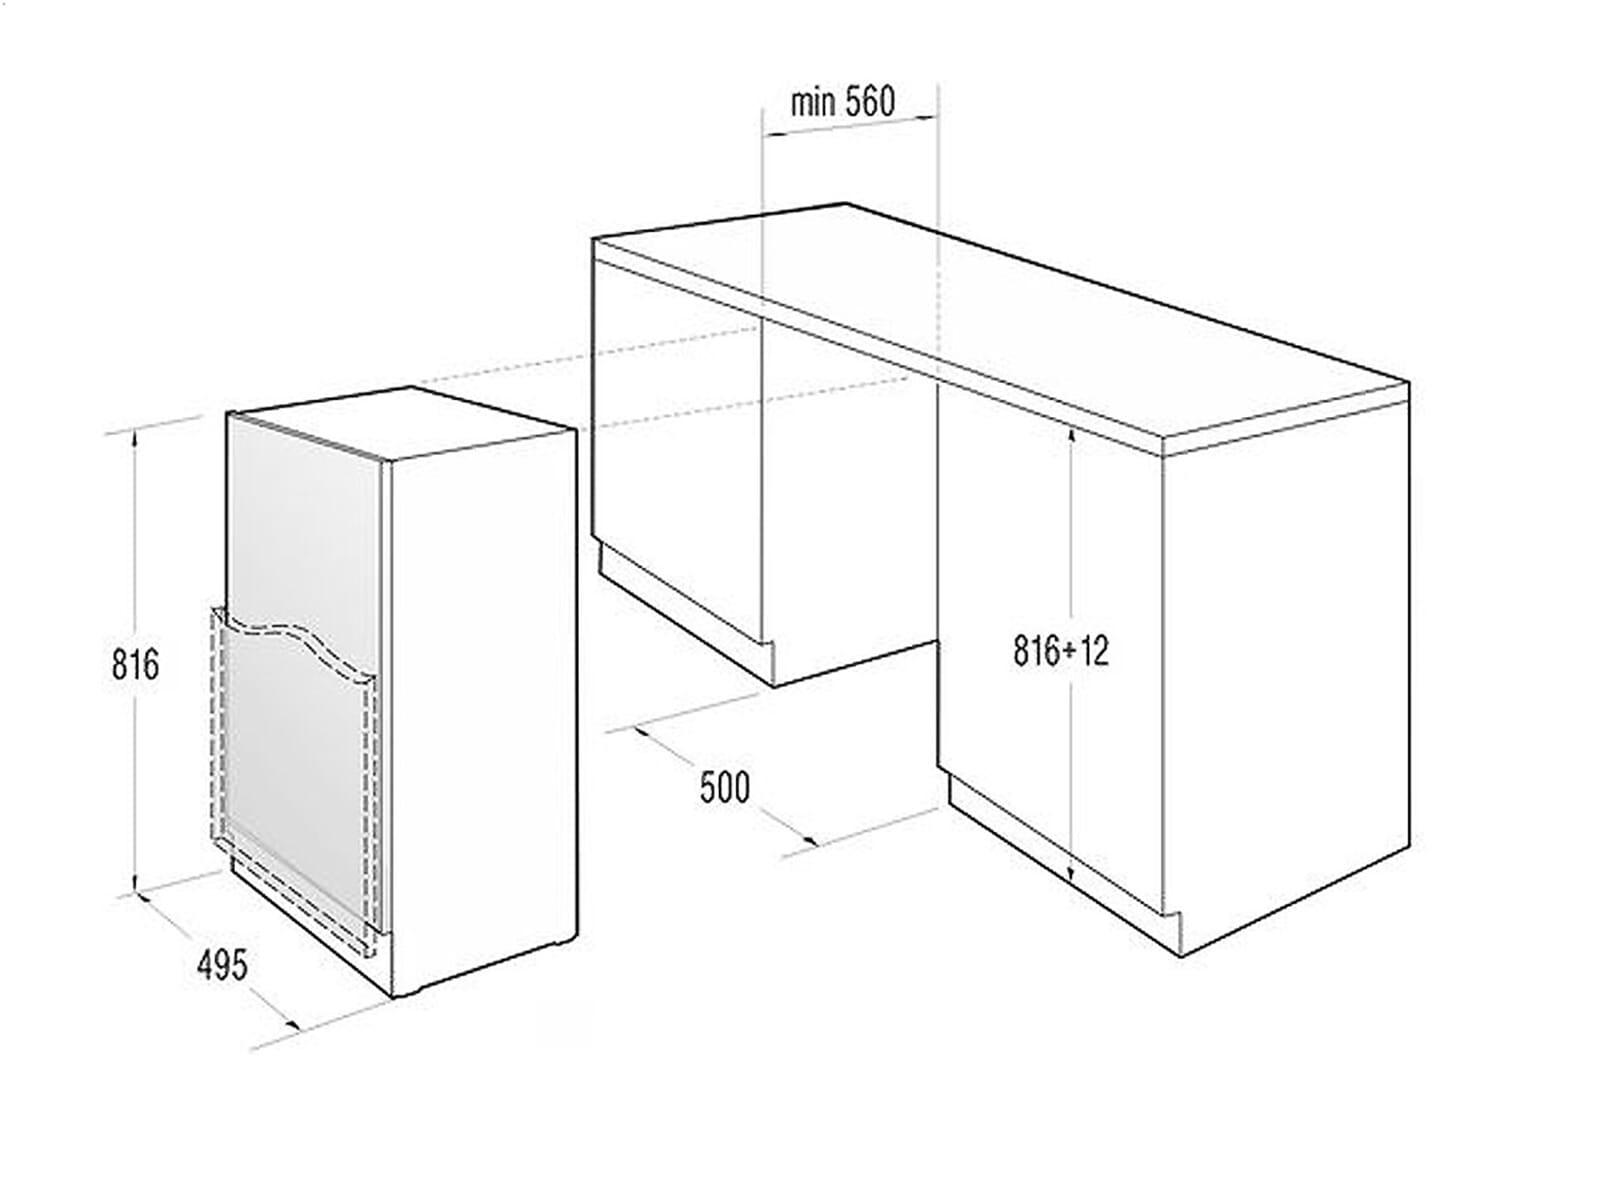 gorenje ru 5004 a unterbau k hlschrank f r 288 80 eur. Black Bedroom Furniture Sets. Home Design Ideas